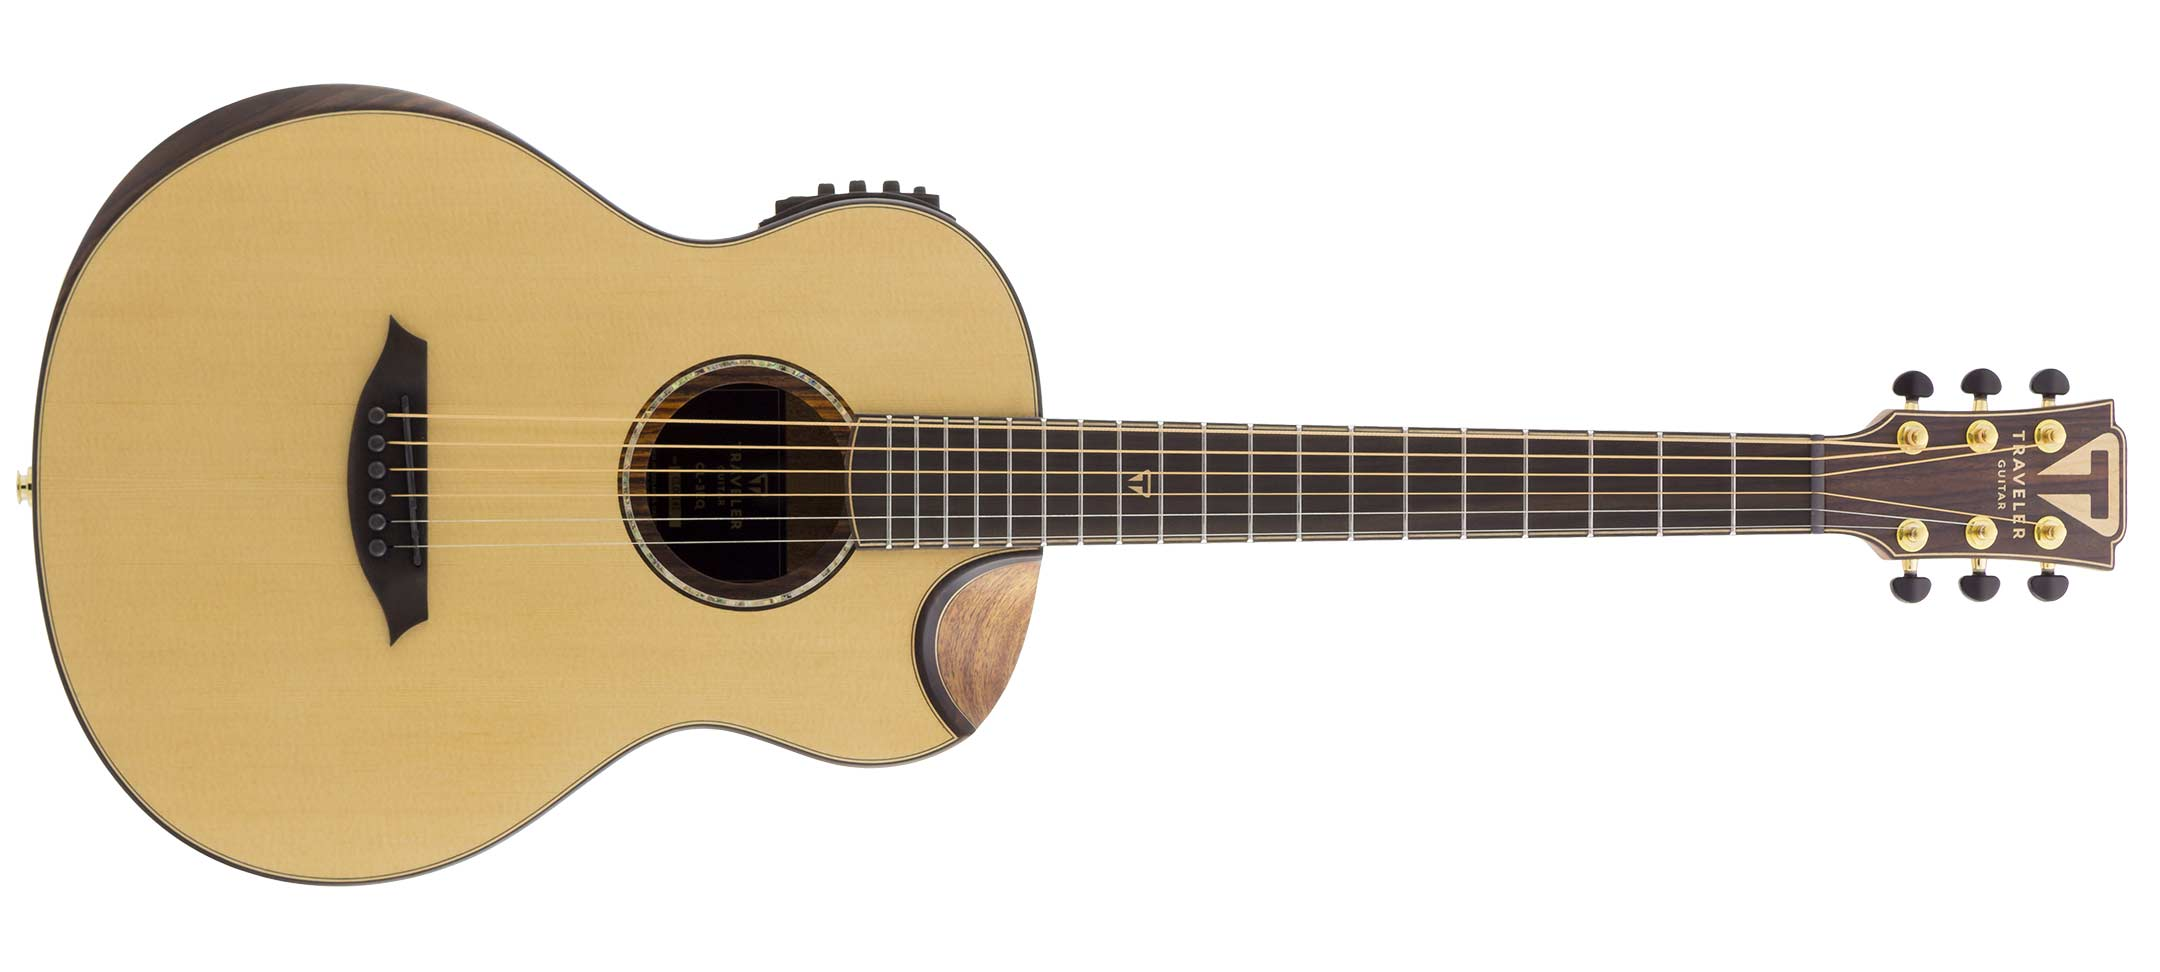 product review traveler cl 3eq acoustic electric guitar guitar girl magazine. Black Bedroom Furniture Sets. Home Design Ideas